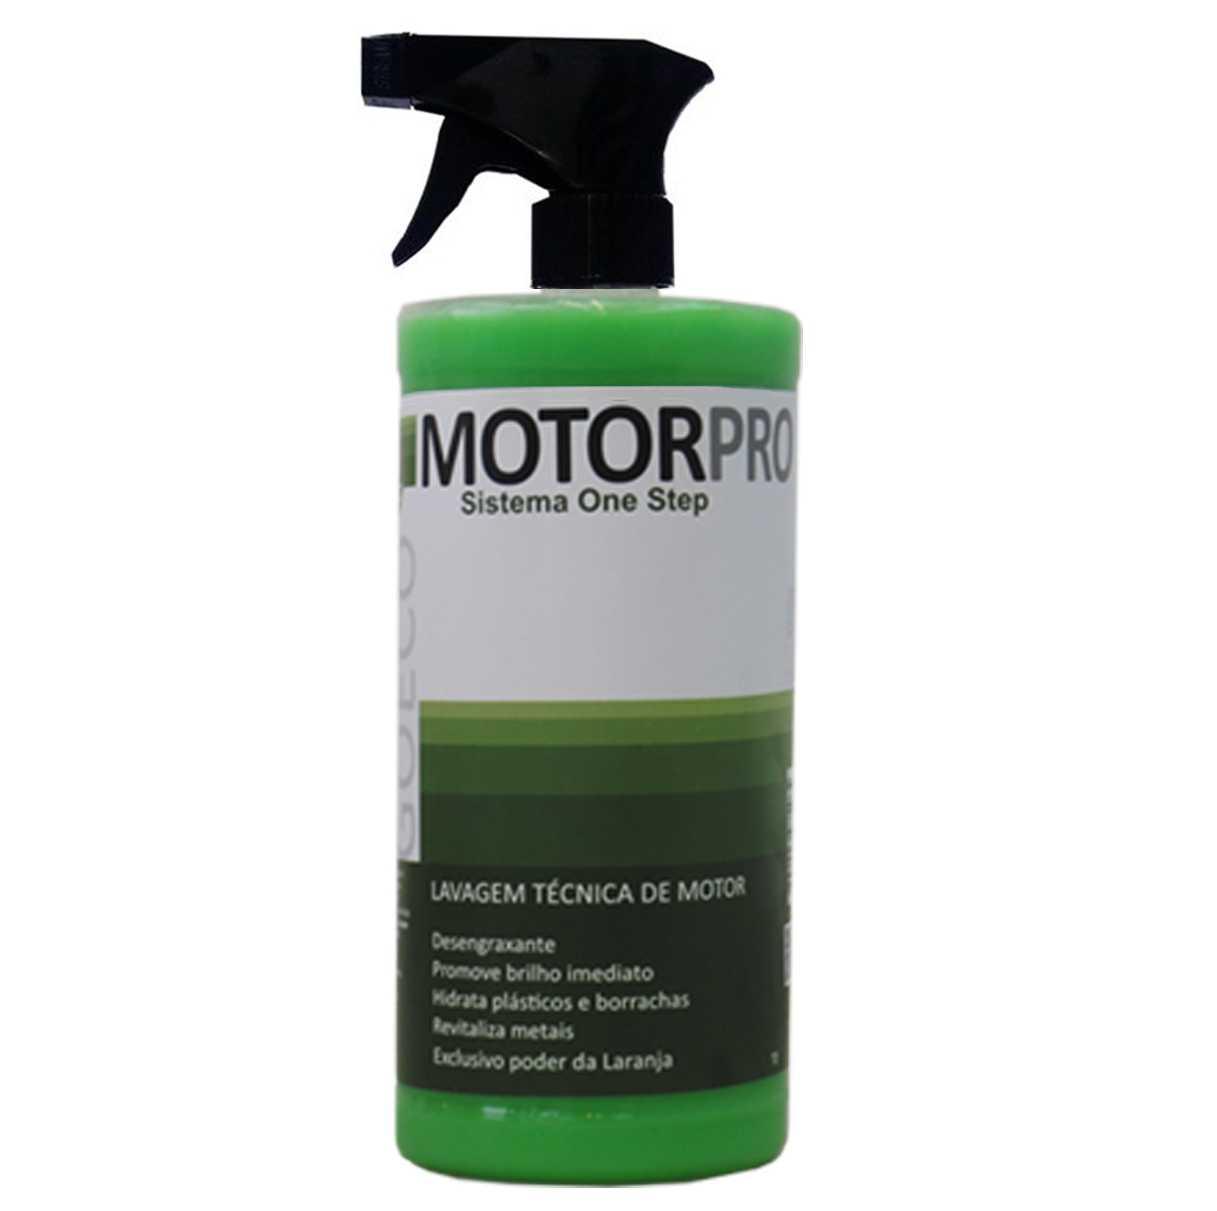 MotorPro - Lavagem Técnica de motor  1Lt  (Go Eco Wash)  - Loja Go Eco Wash